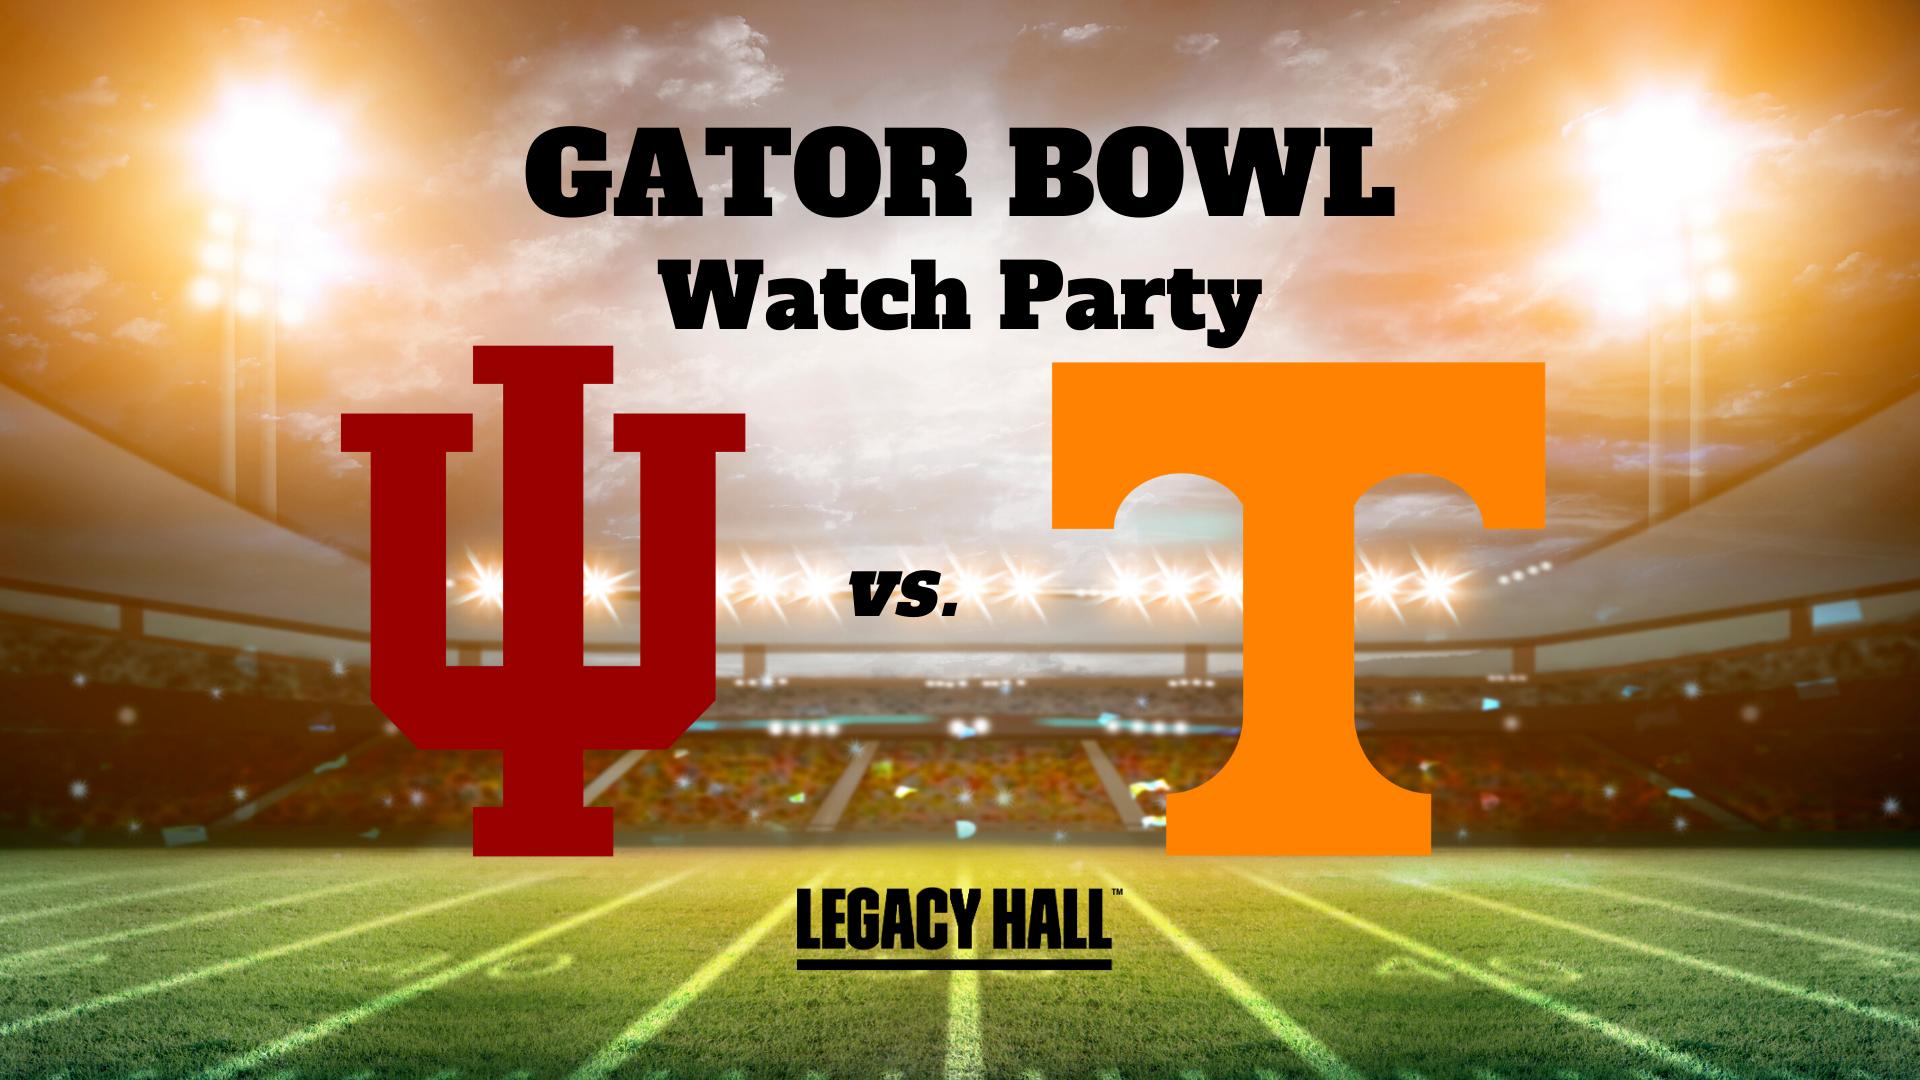 Gator Bowl Watch Party - hero